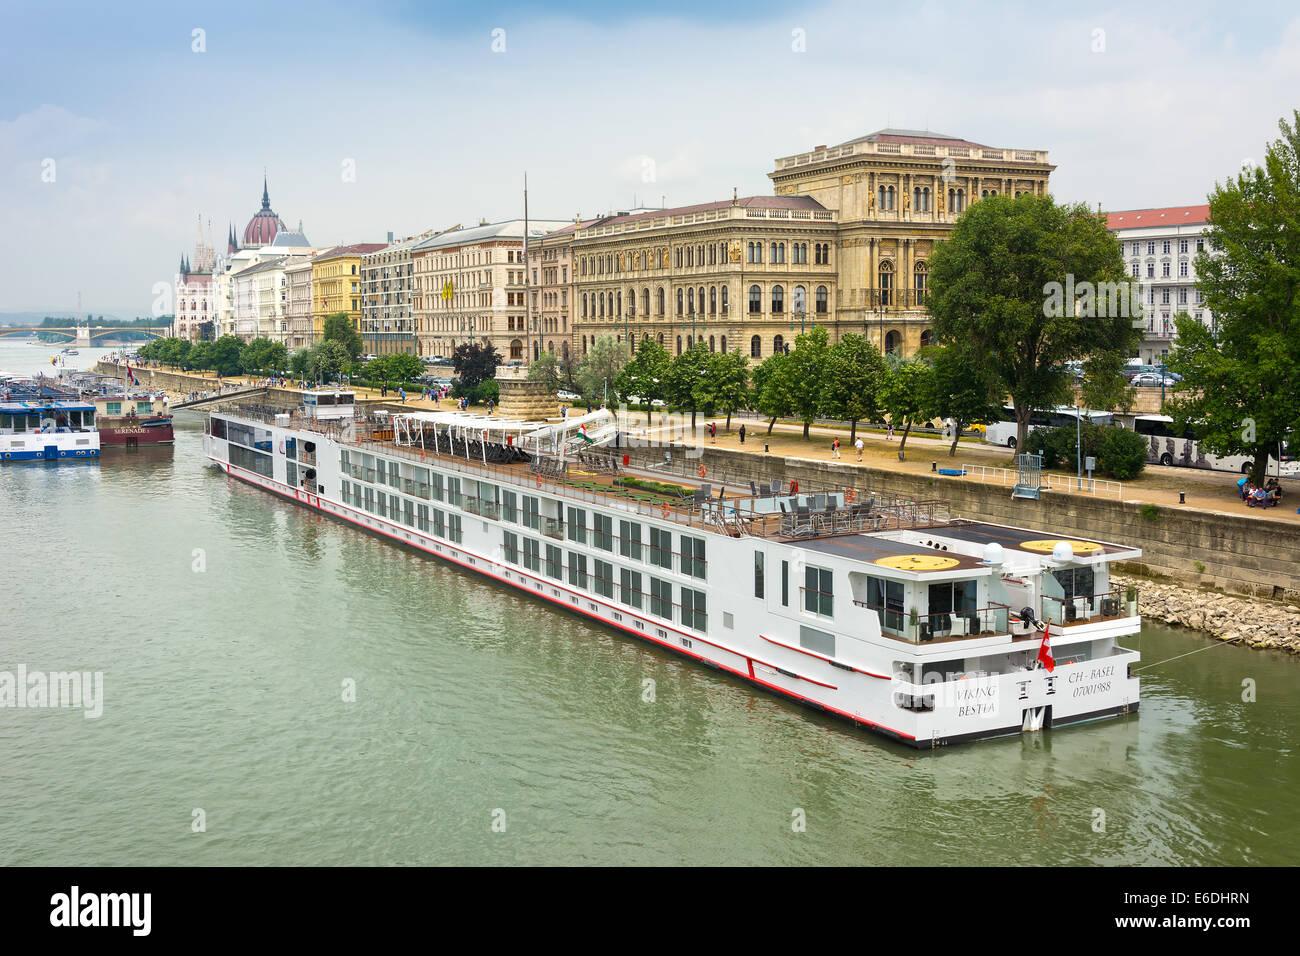 Viking Cruises Bestla Longship moored on the Danube in Budapest - Stock Image